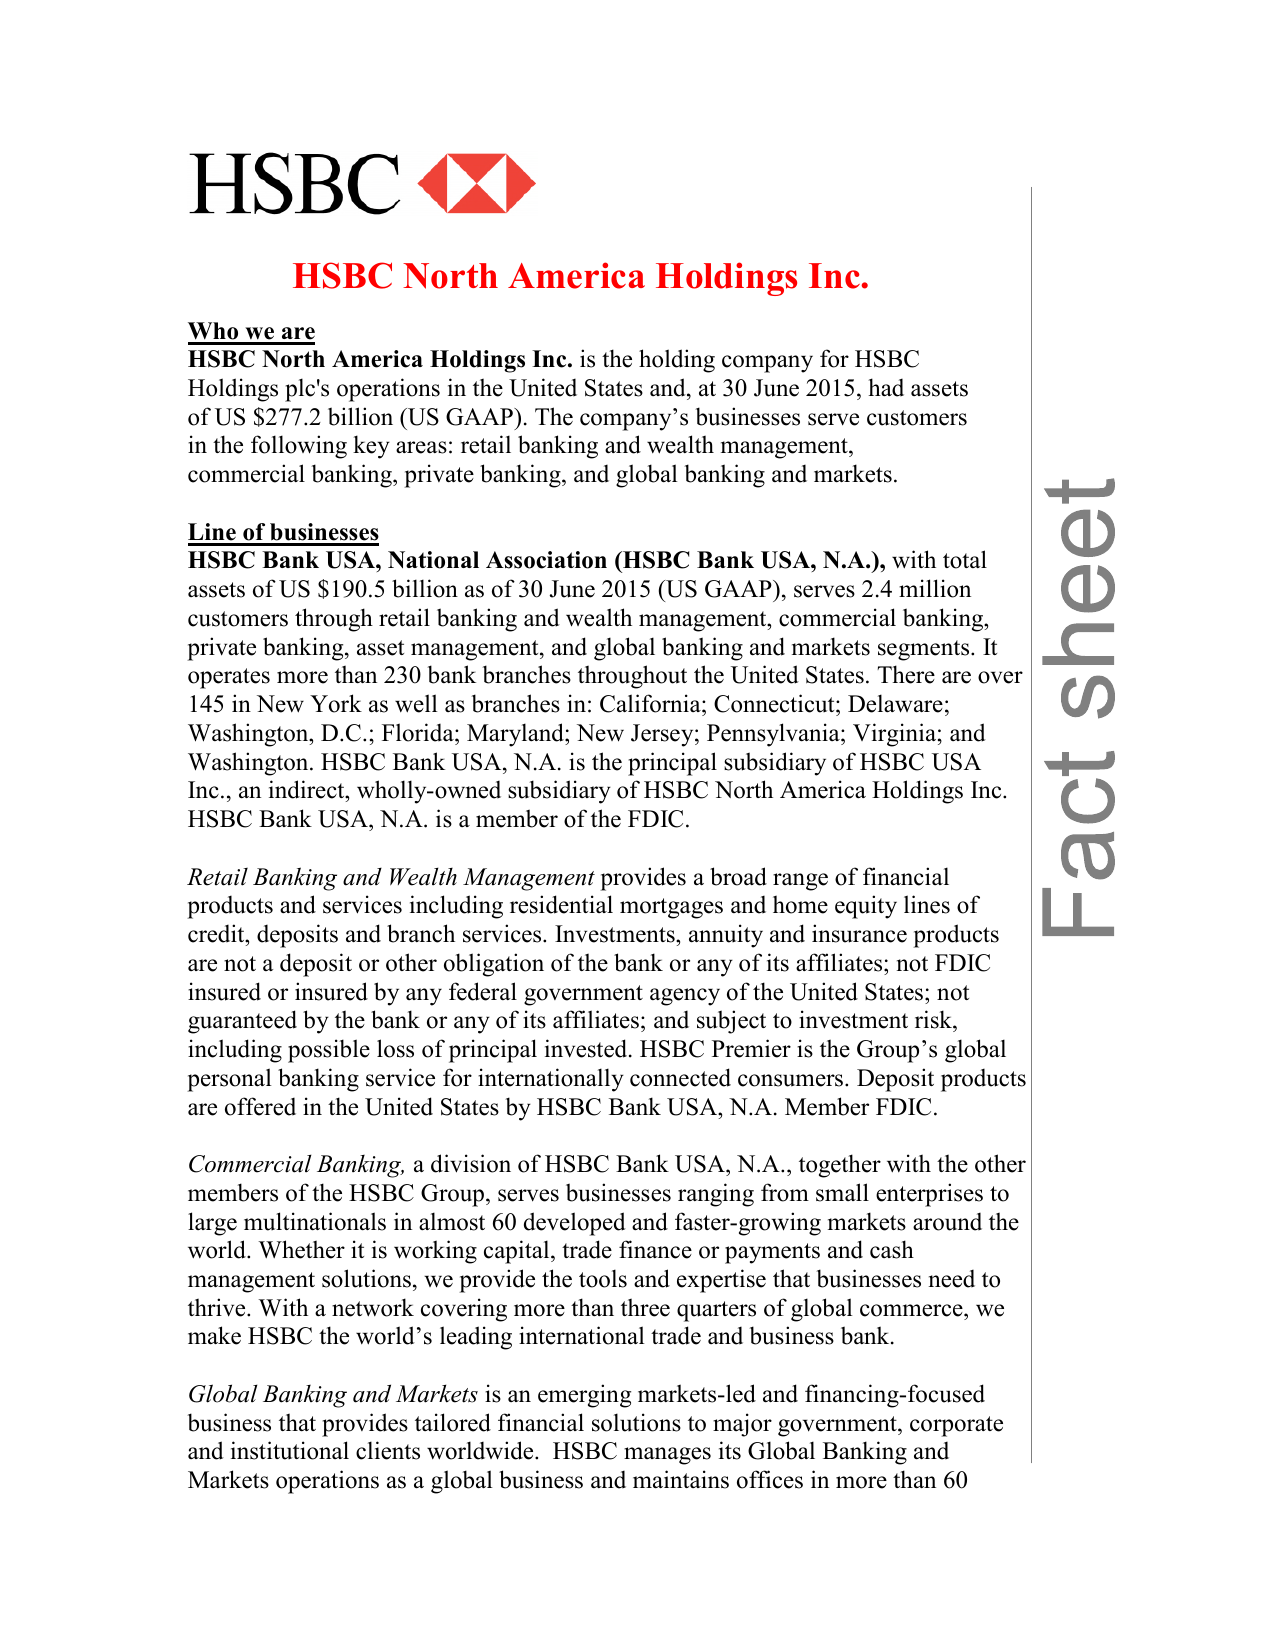 HSBC North America Holdings Inc